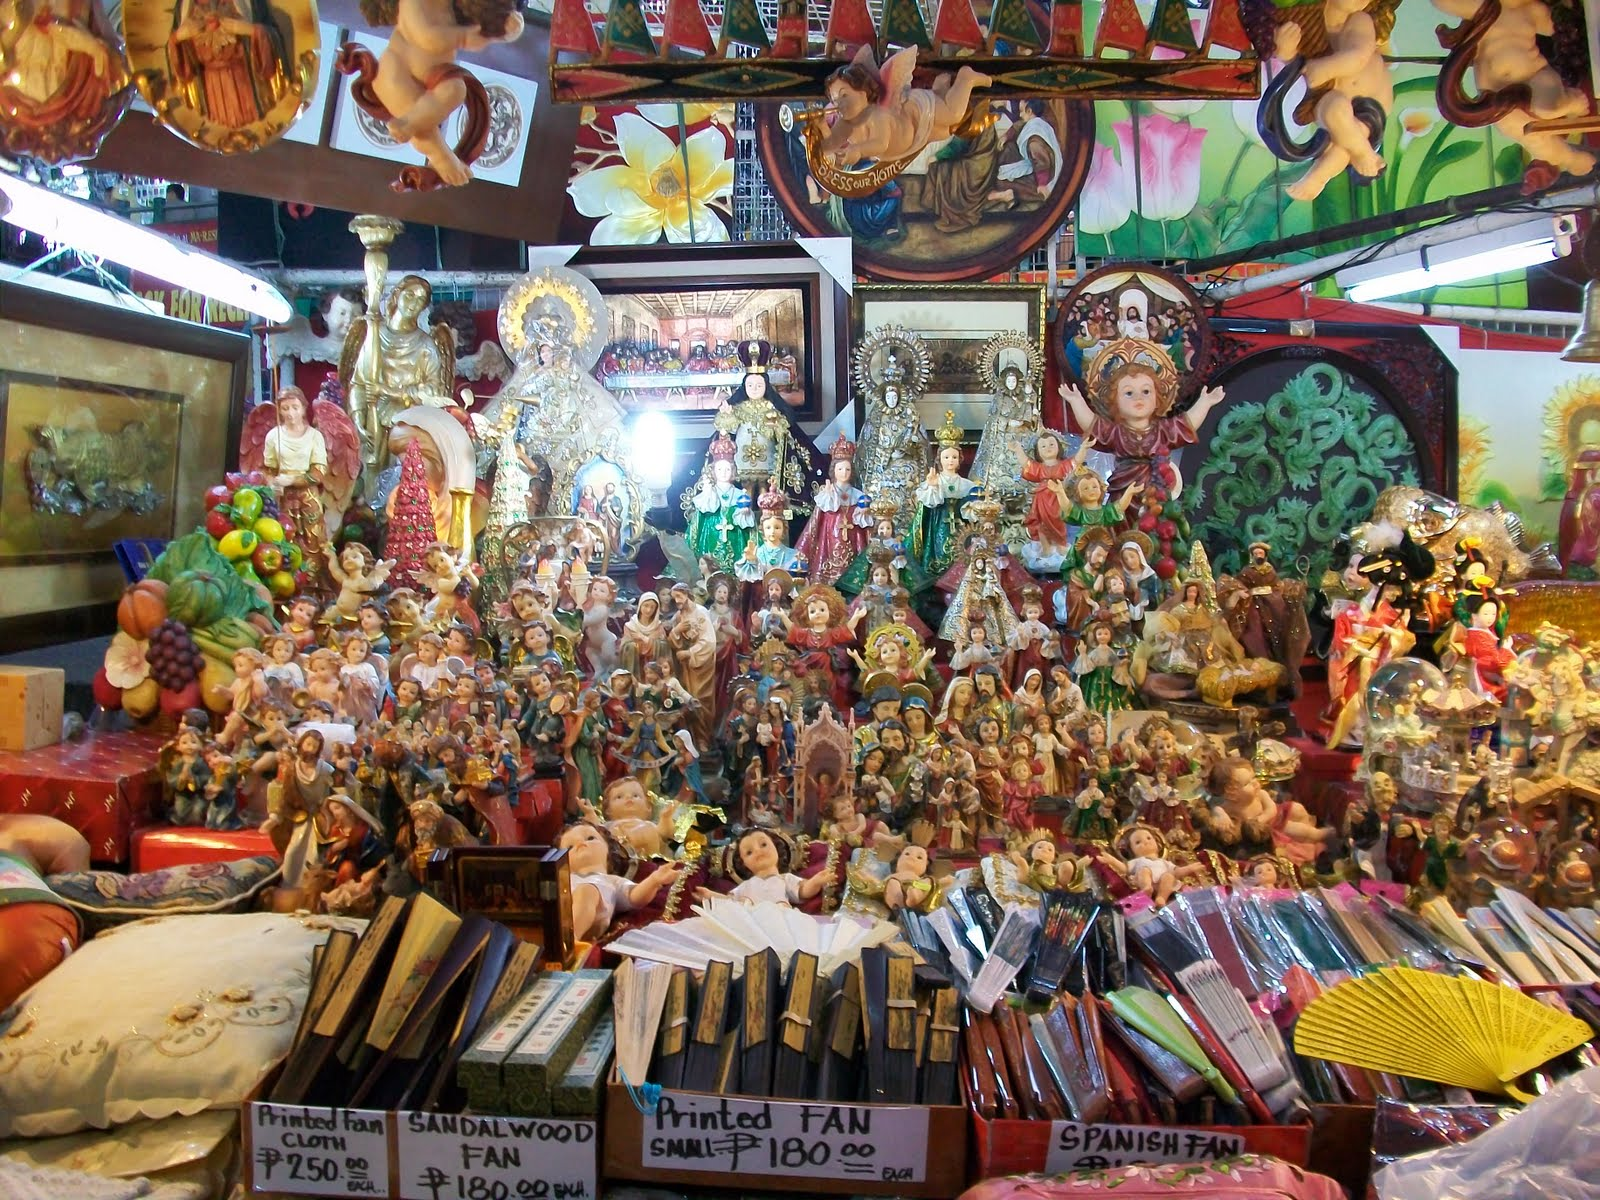 Dan Chak Thailand  city photos : ... Pasar yang Wajib Dikunjungi Saat ke Bangkok, Thailand Blog Tripvisto